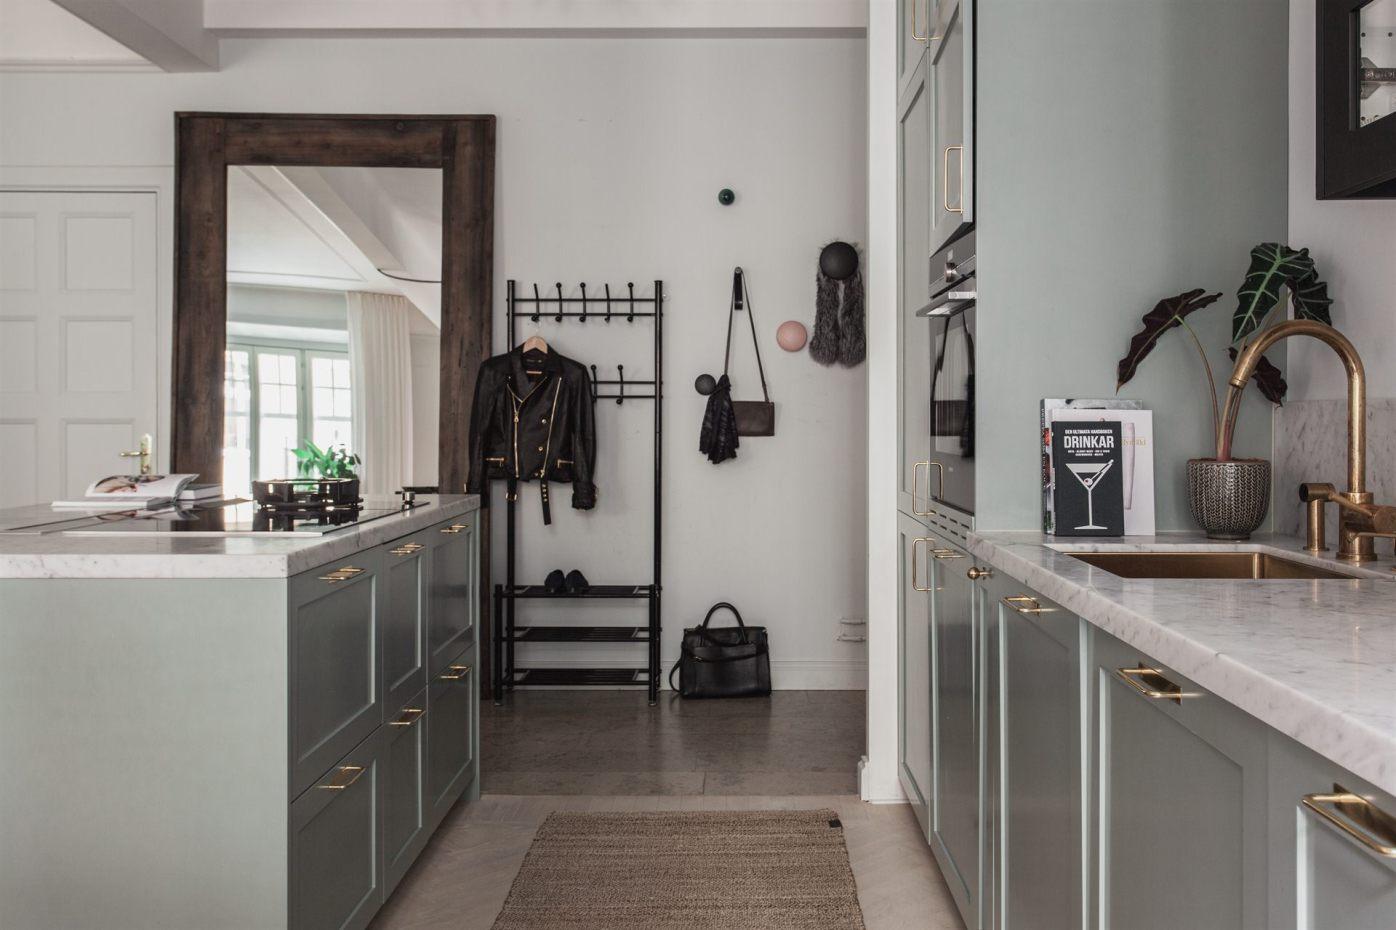 квартира 67 квм кухня прихожая зеркало